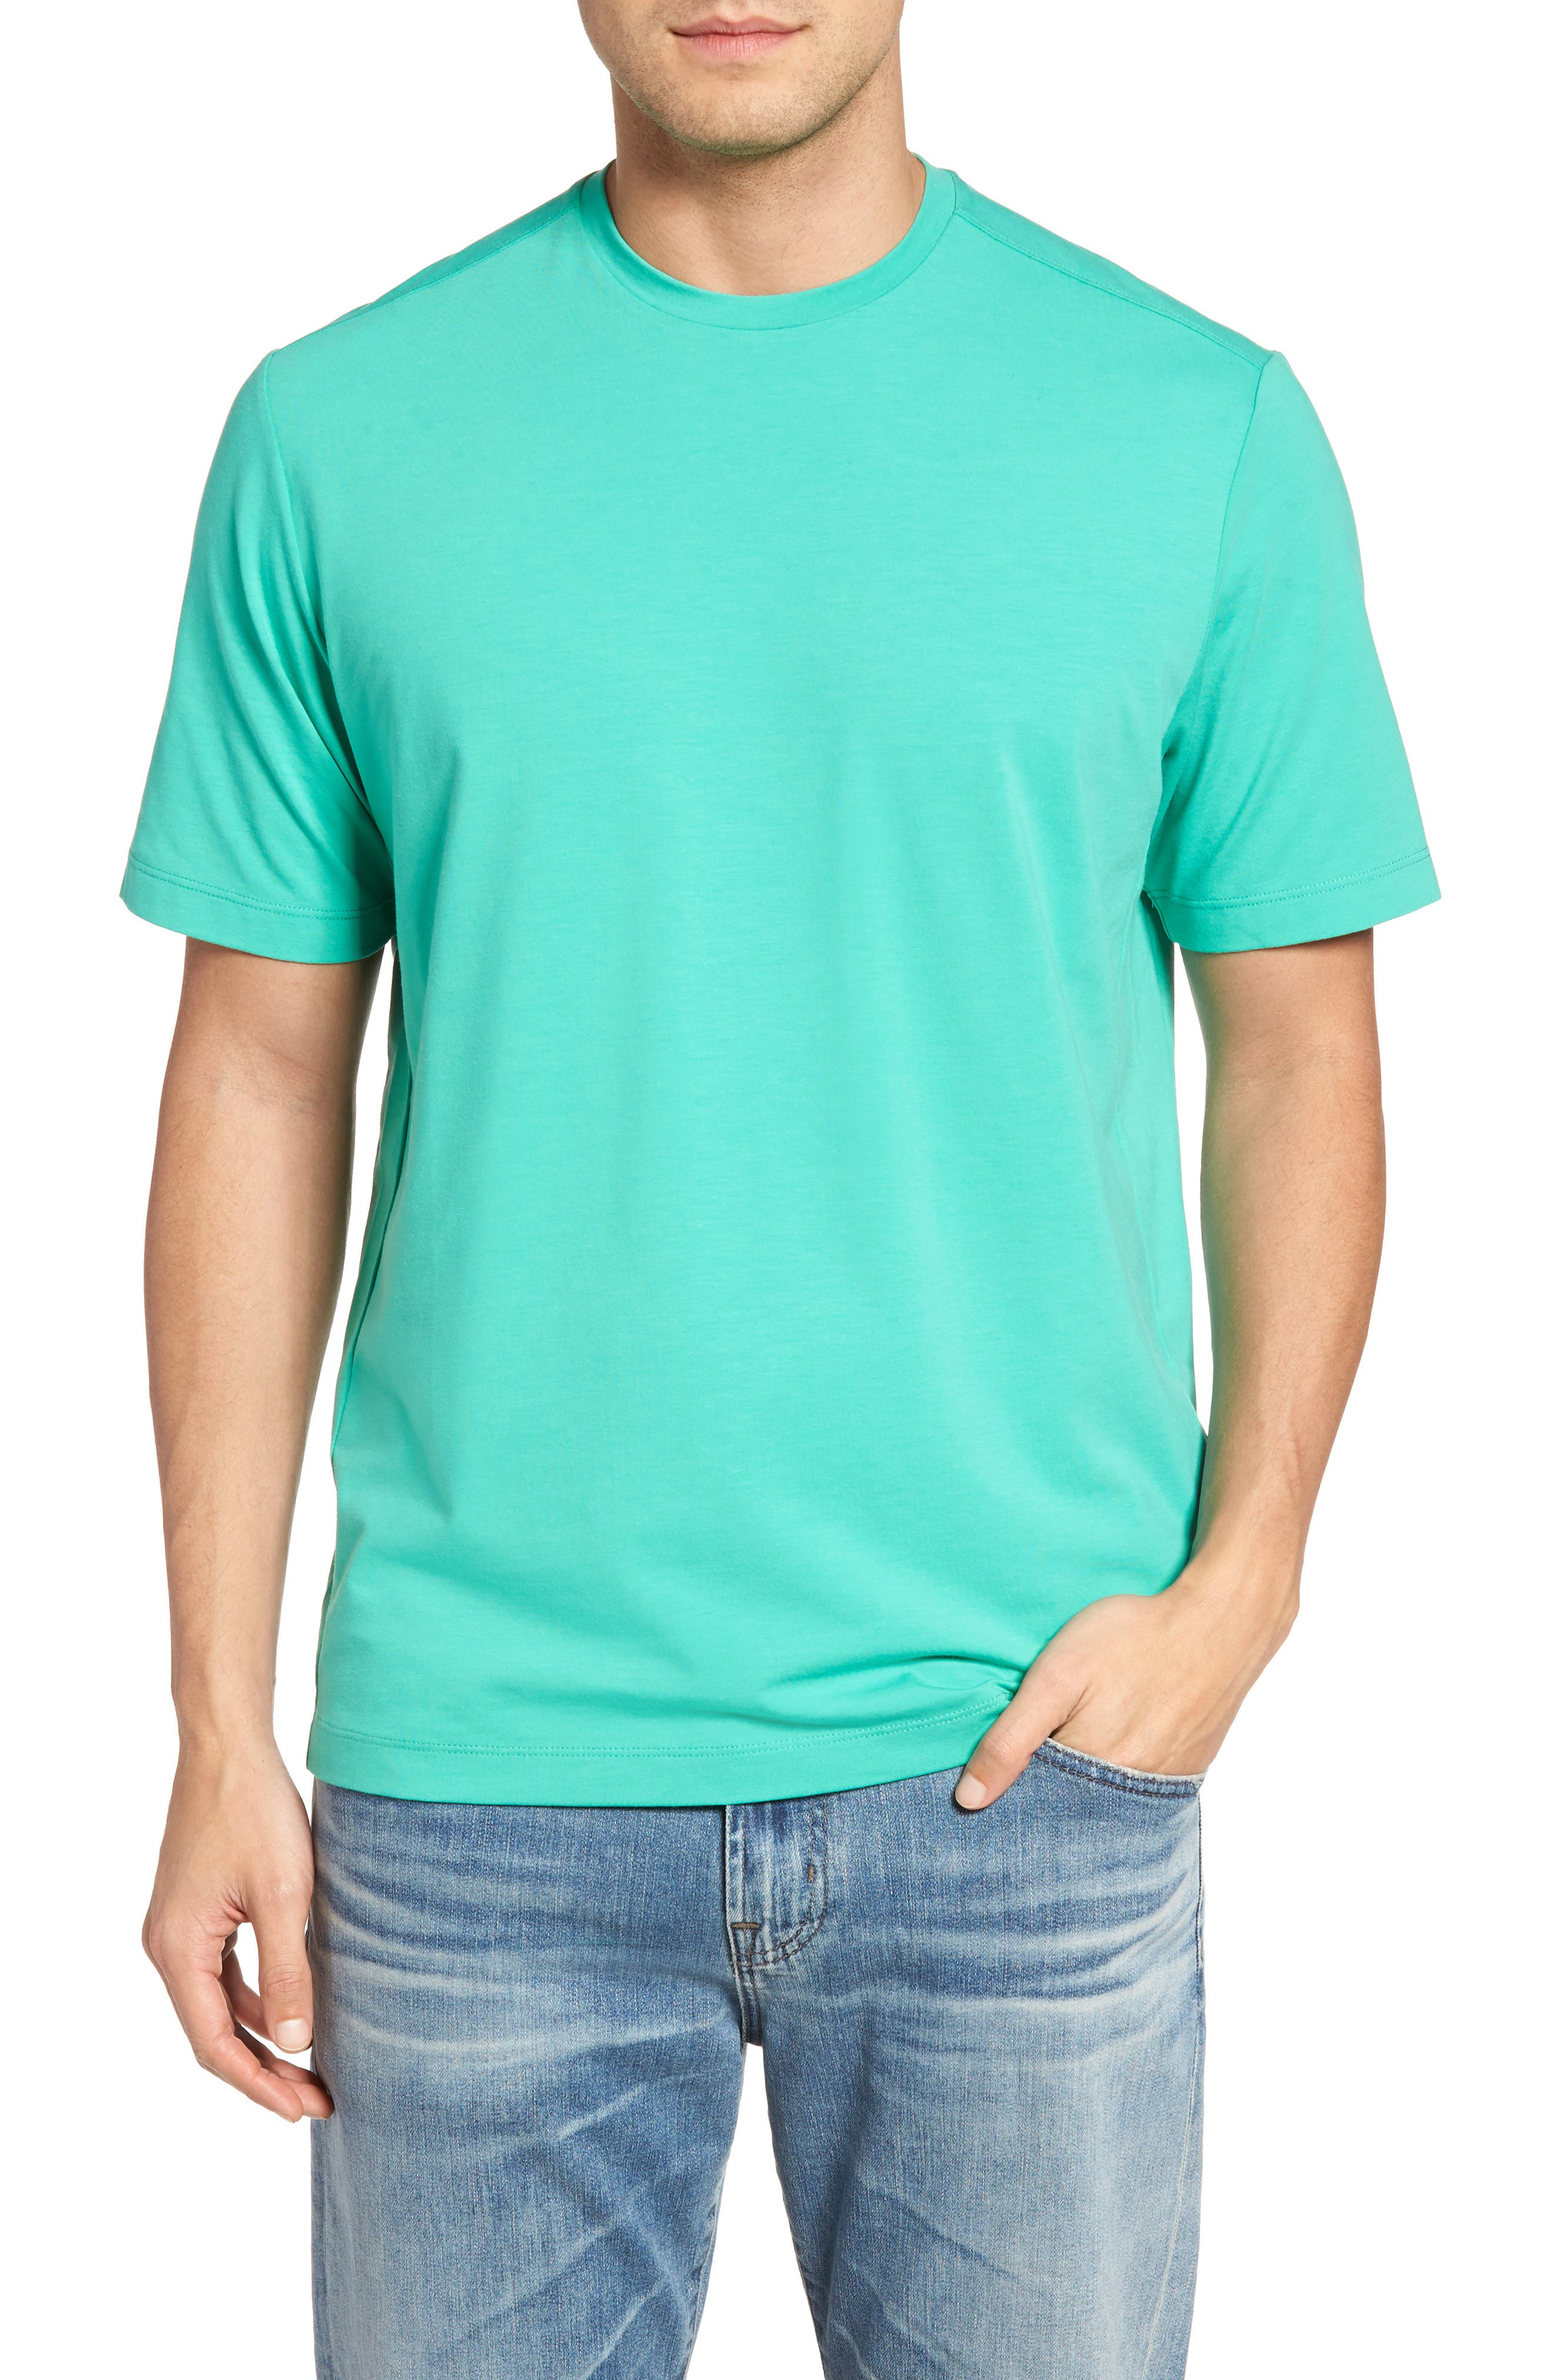 Tropicool T-Shirt,                             Main thumbnail 7, color,